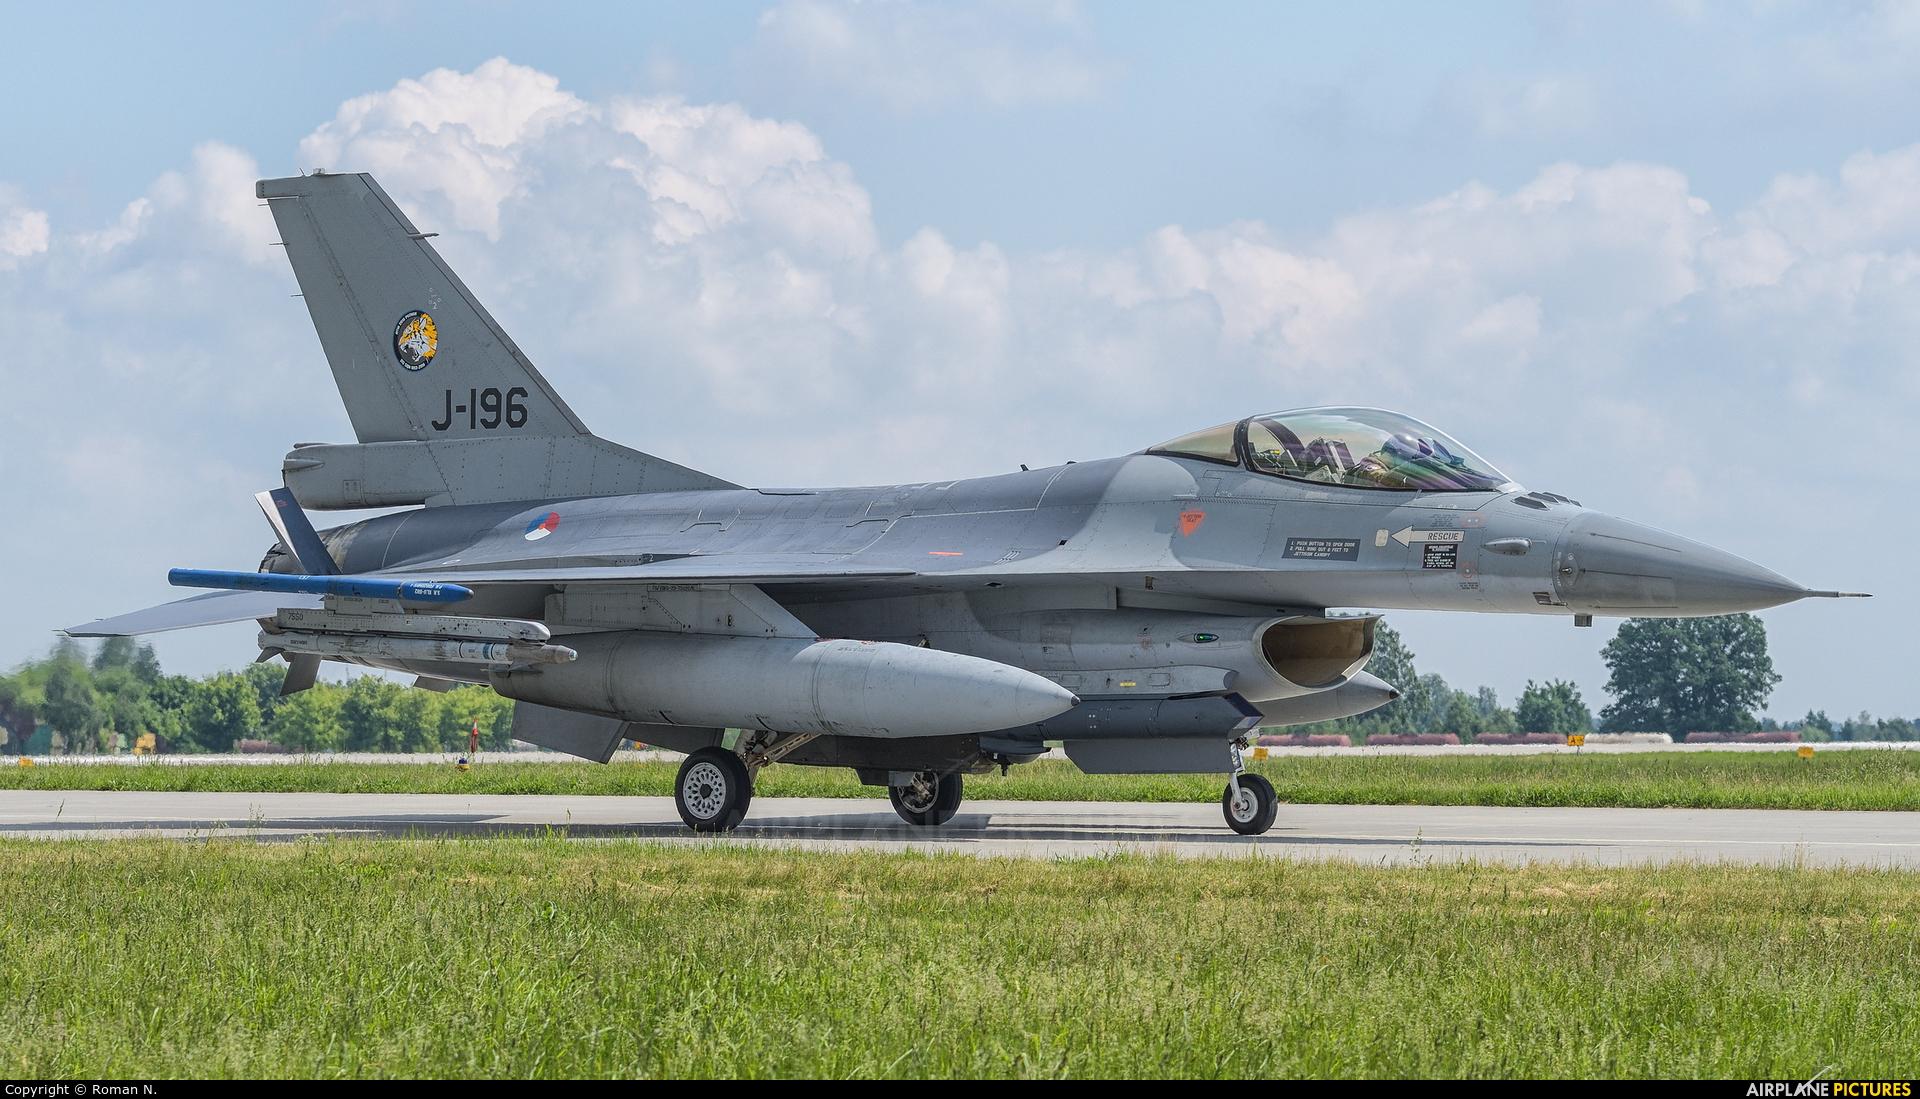 Netherlands - Air Force J-196 aircraft at Poznań - Krzesiny